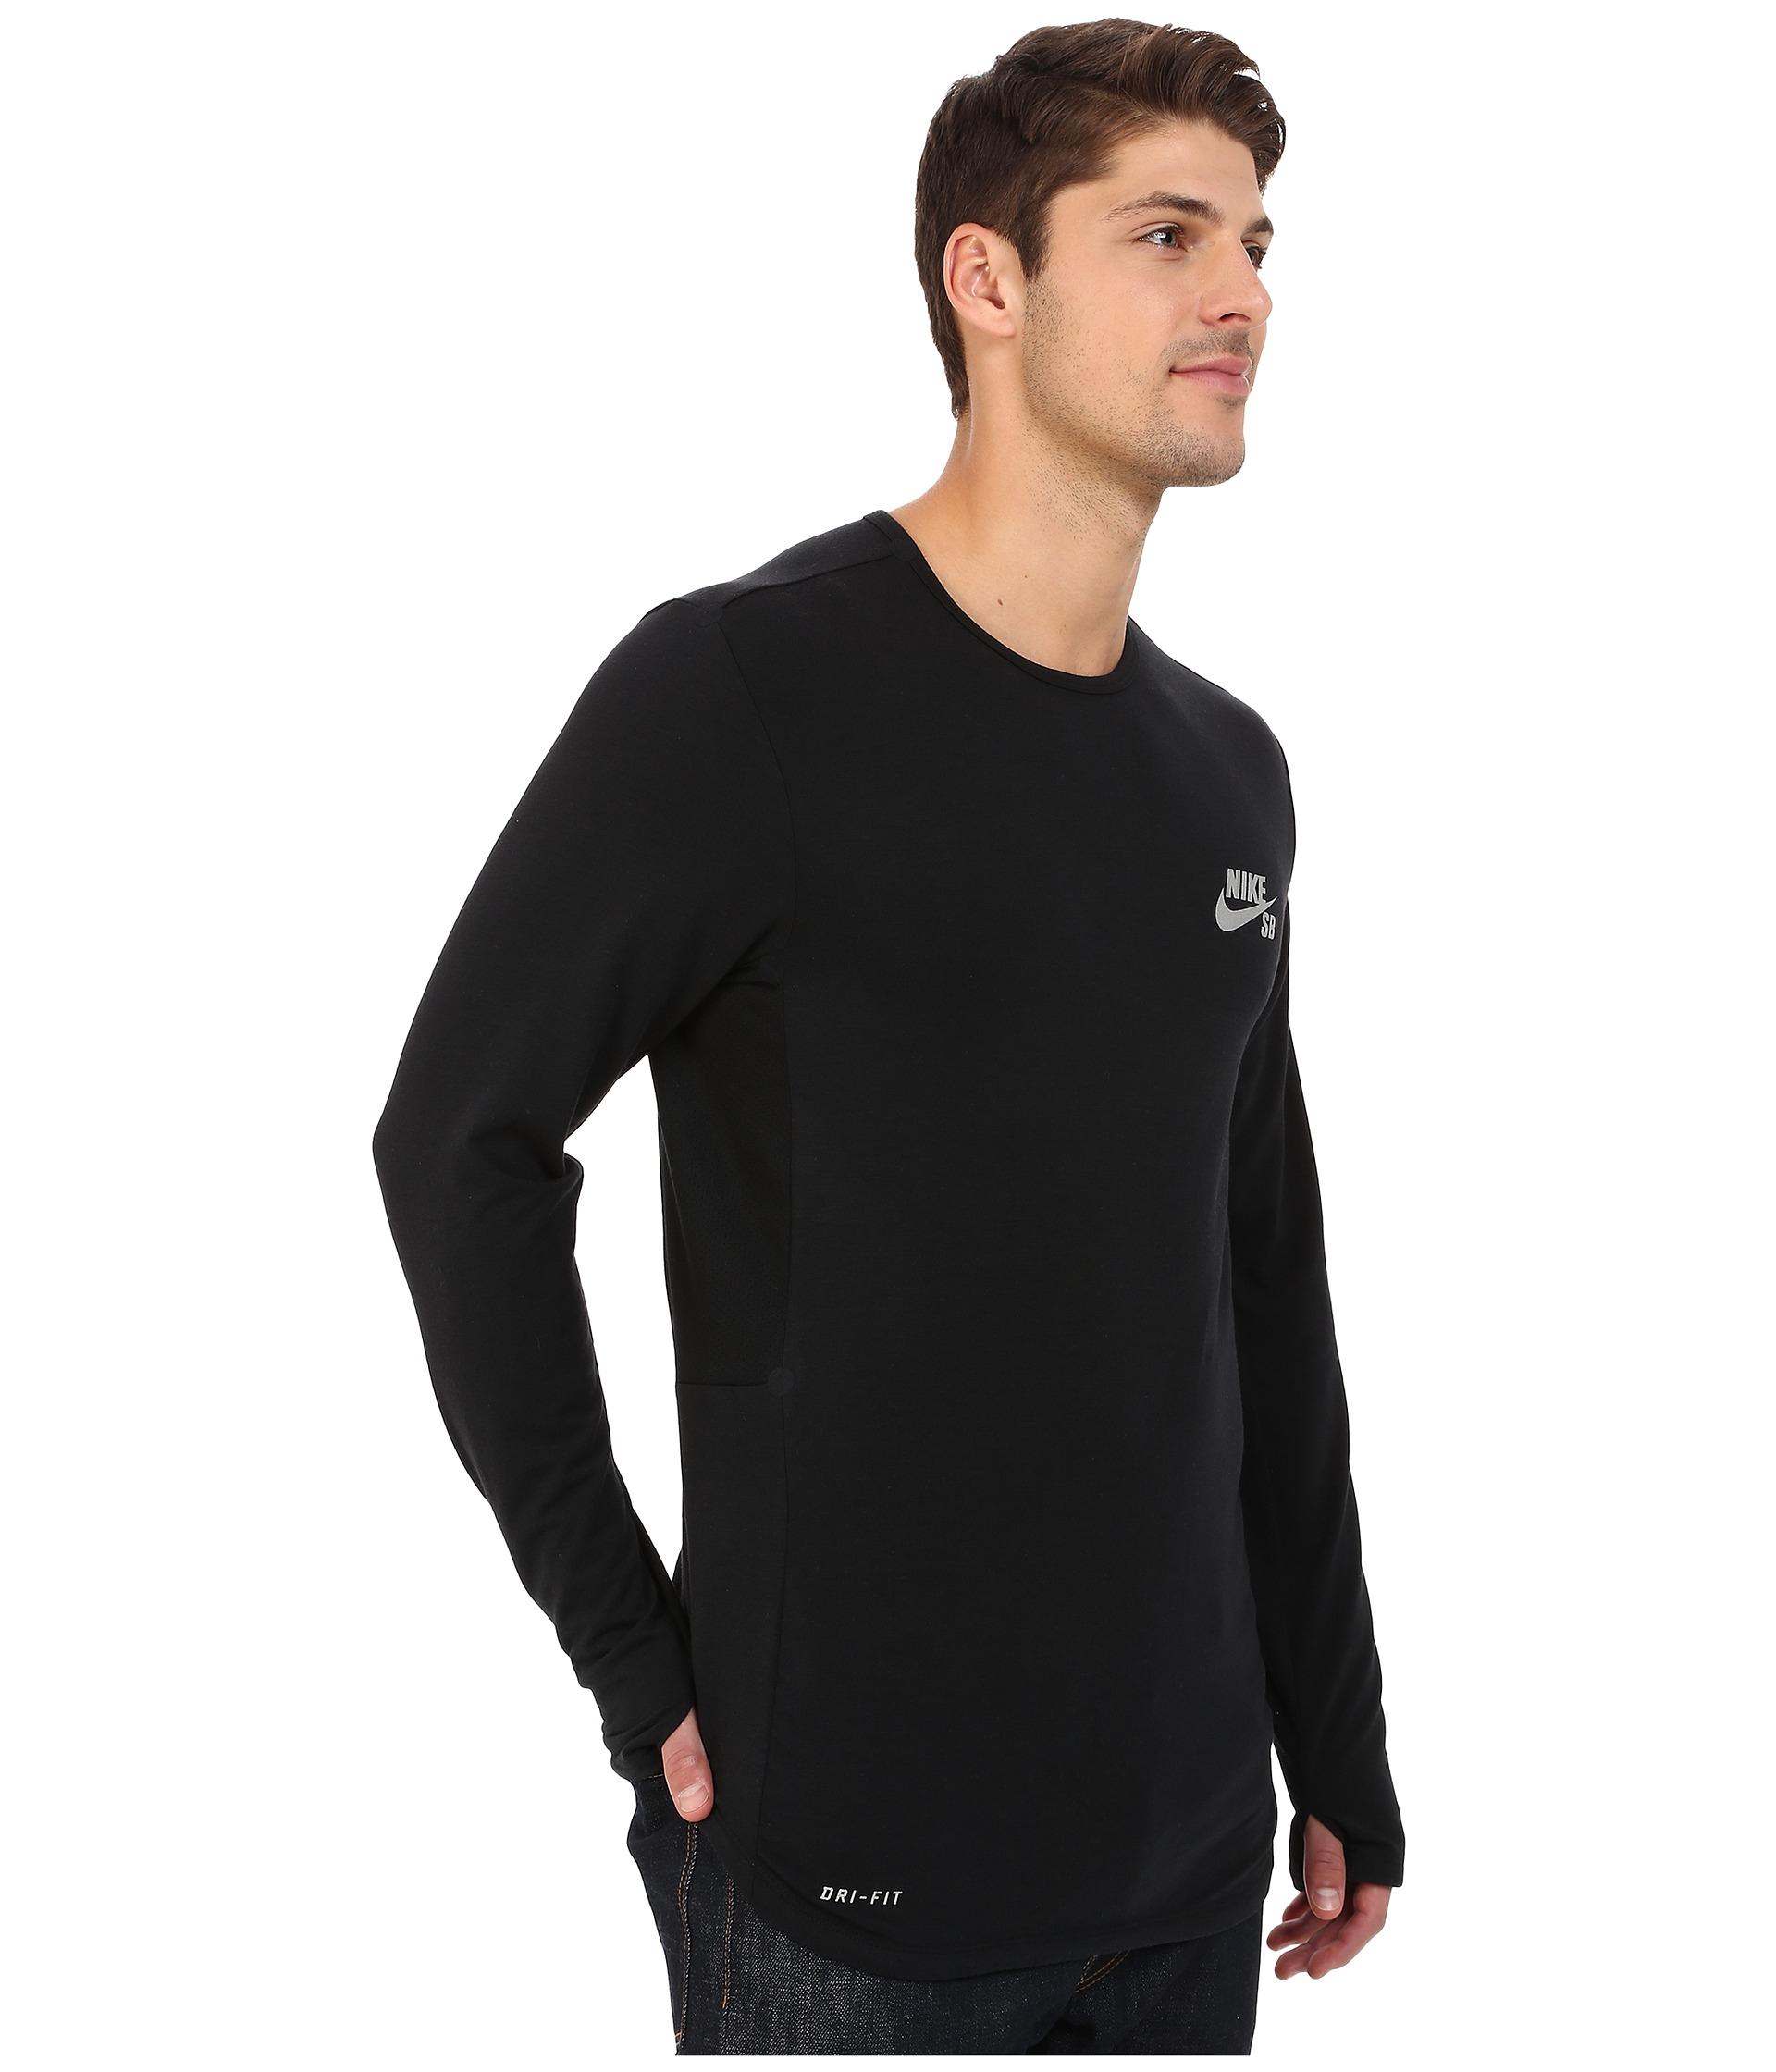 35e6bef1 Nike Sb Skyline Dri-fit™ Cool Long Sleeve Crew in Black for Men - Lyst